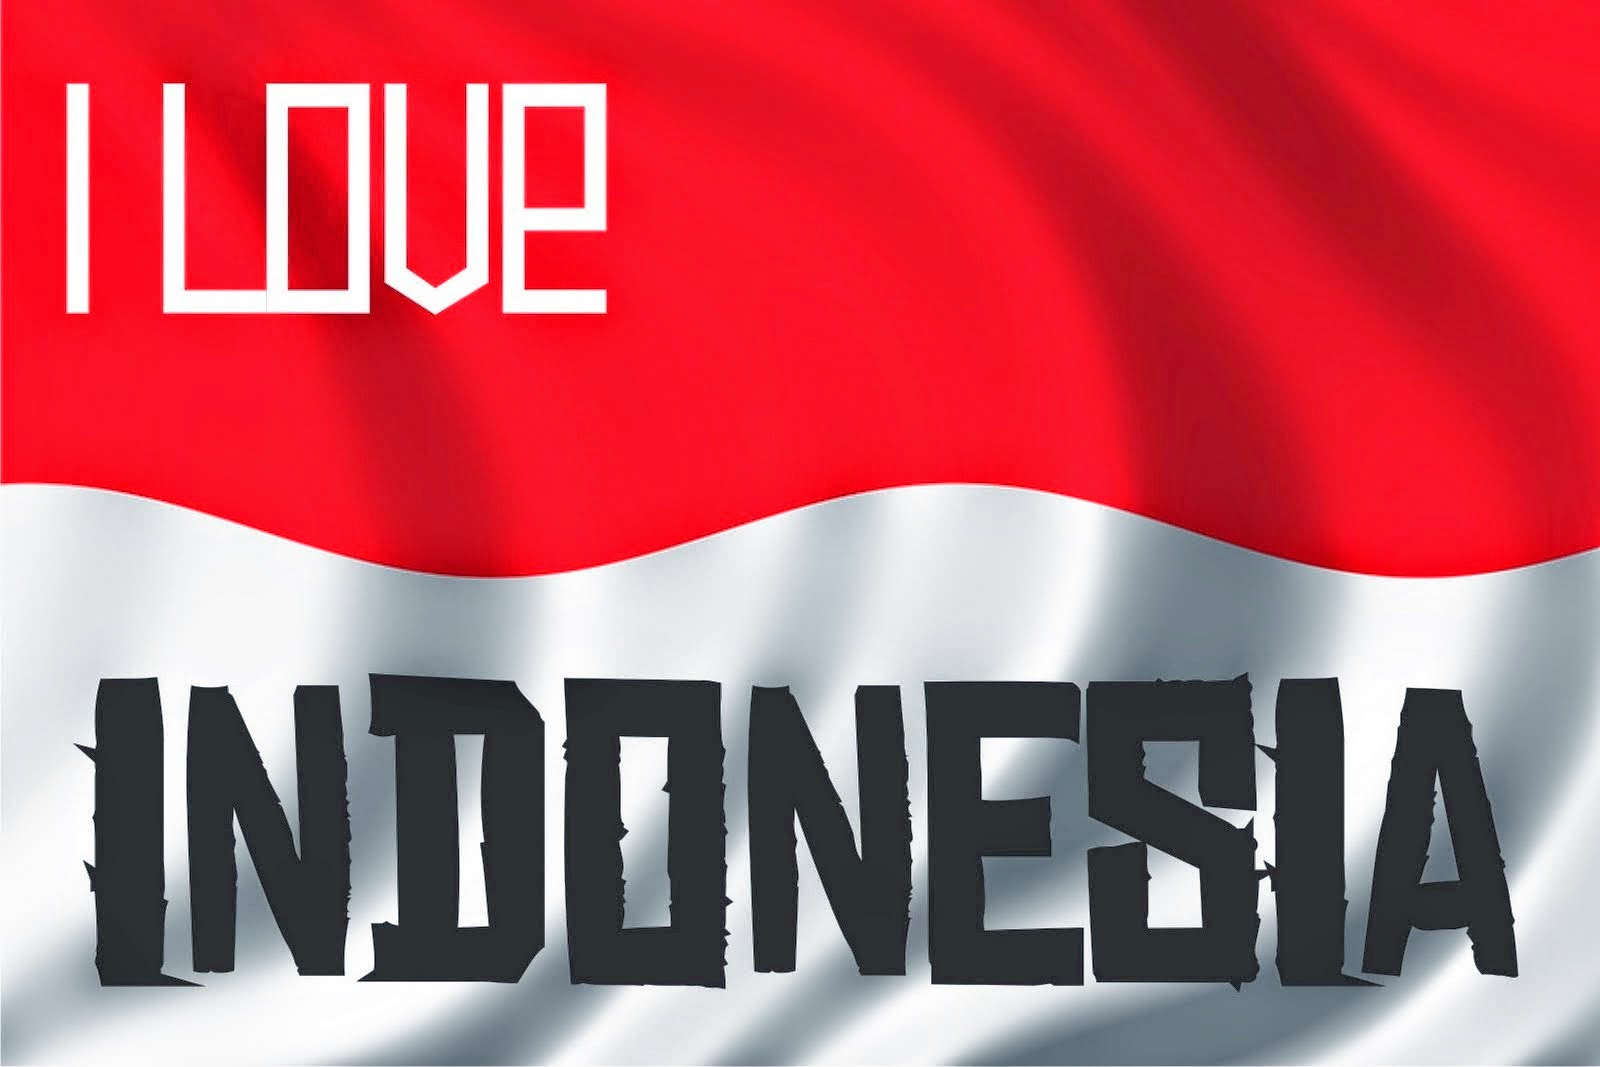 Ssh Lokal Indonesia 18 Juni 2014